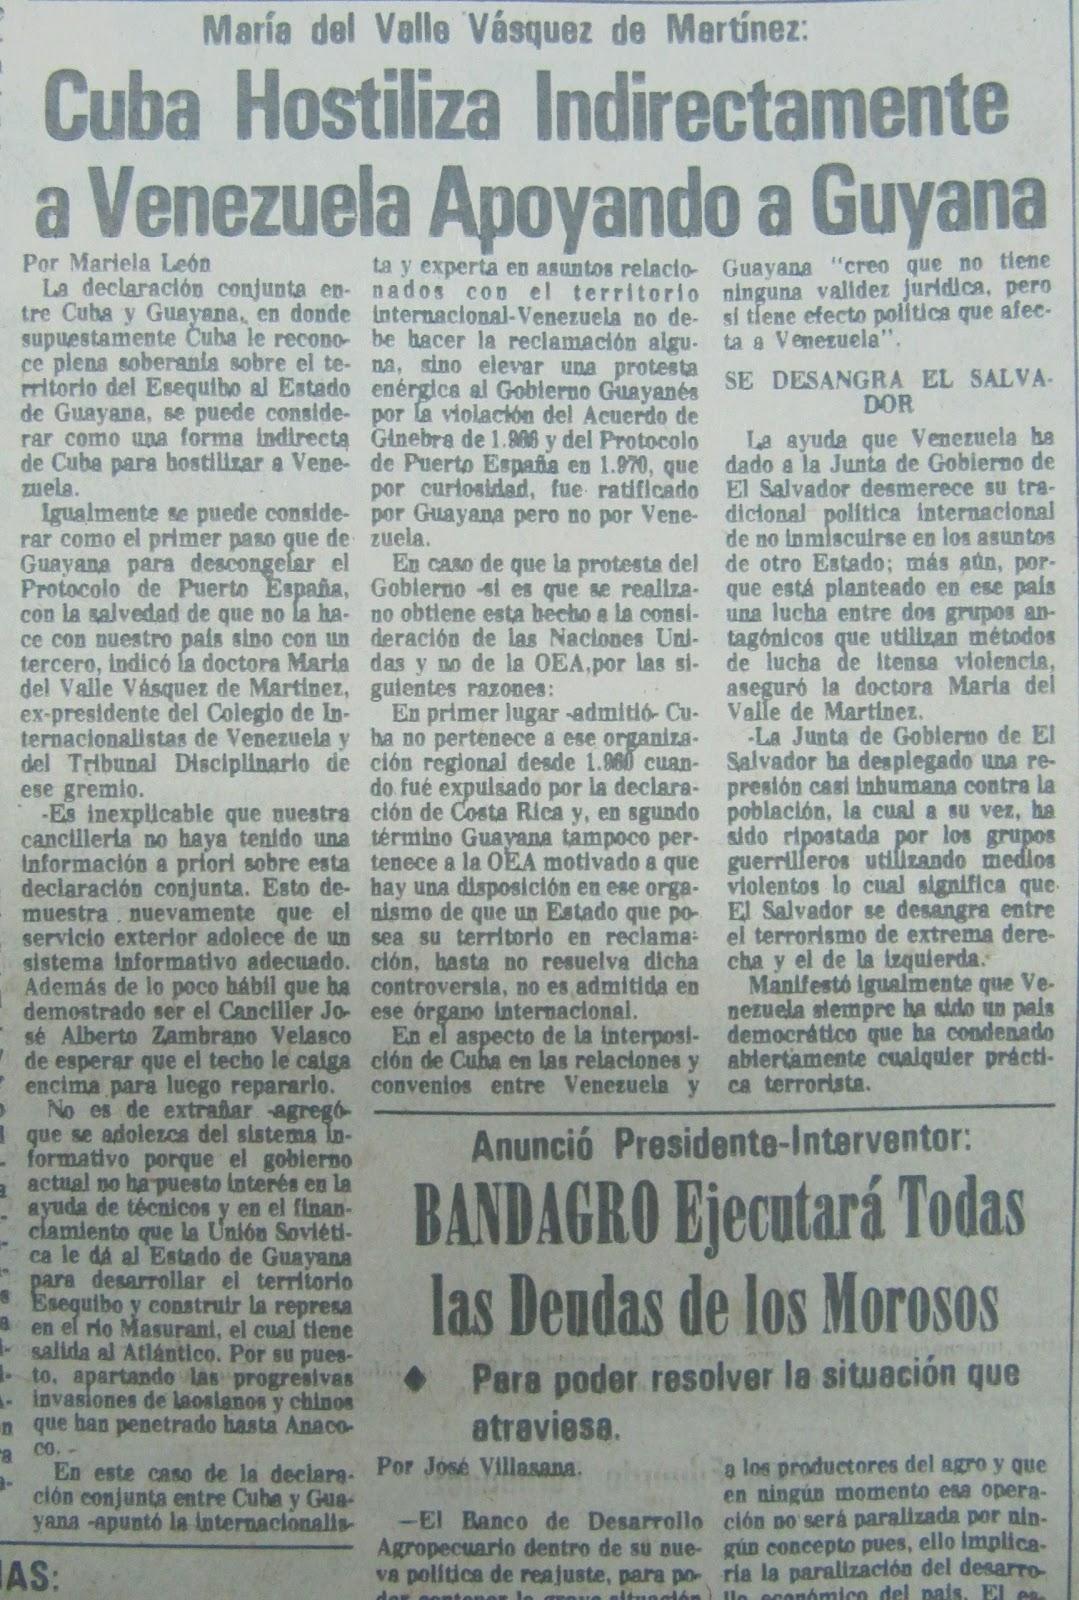 Venezuela vs guyana 16-01-1981+Maria+del+Valle+V%25C3%25A1squez+de+Martinez++Cuba+Hostiliza+Indirectamente+a+Guyana+Apoyando+a+Guyana